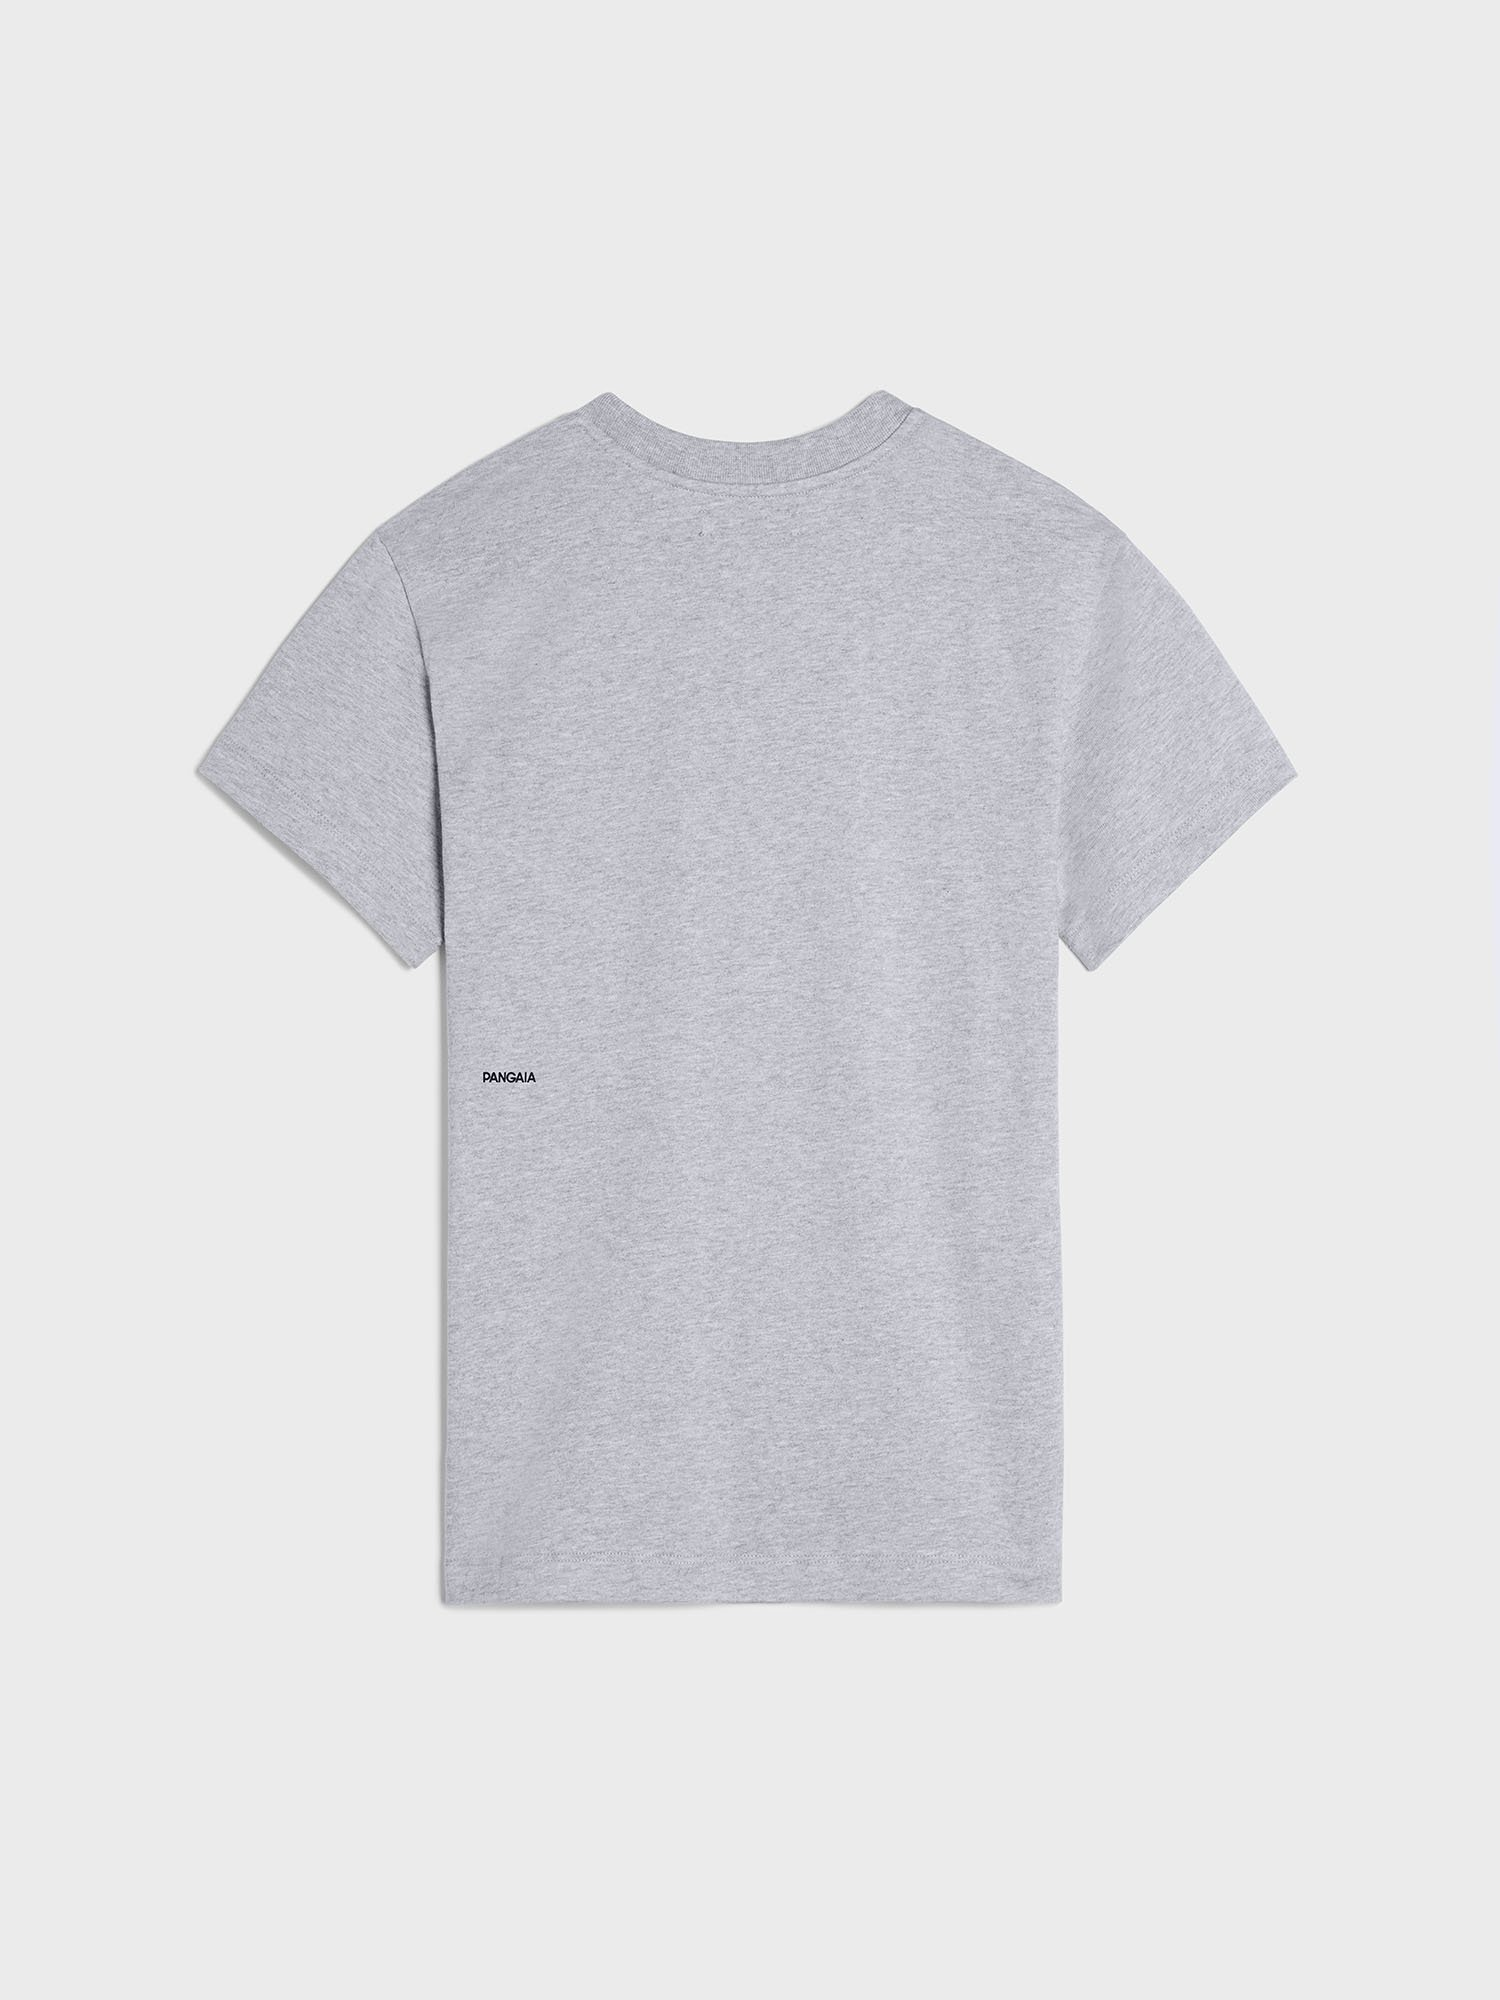 Pangaia Organic Cotton Slim Fit T-shirt with C-FIBER™